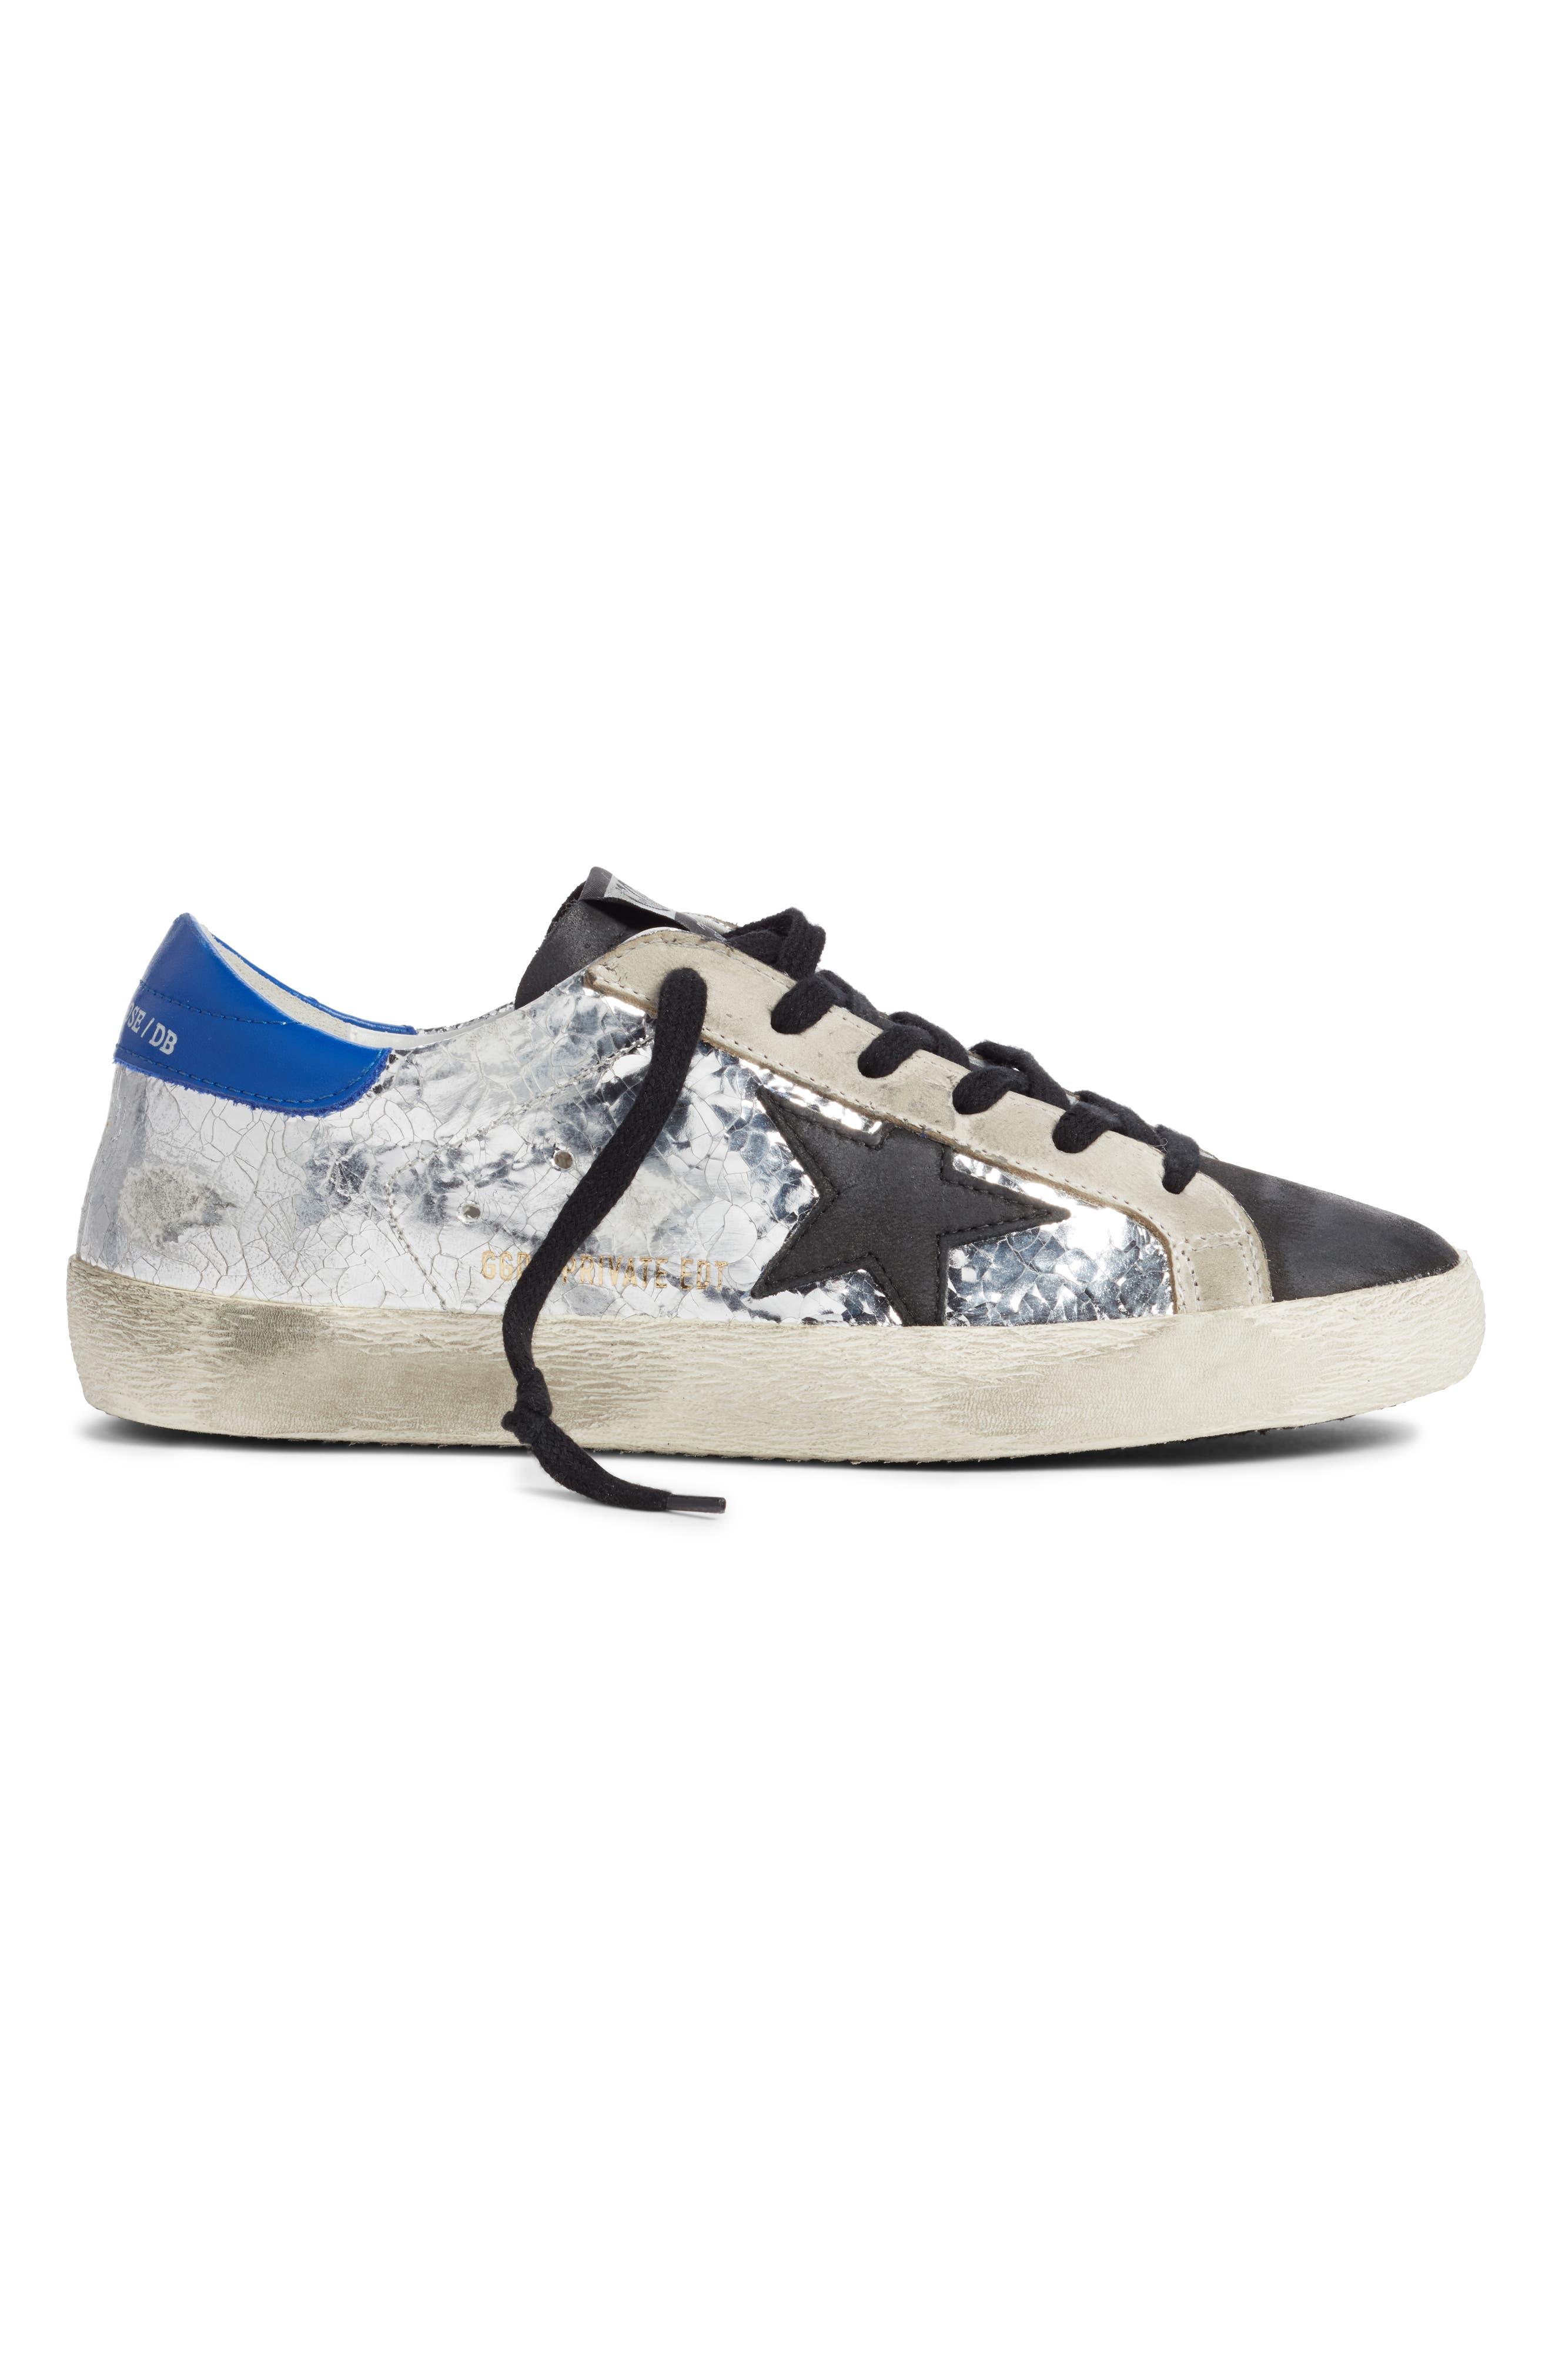 GOLDEN GOOSE,                             Superstar Sneaker,                             Alternate thumbnail 3, color,                             SILVER/ BLUE